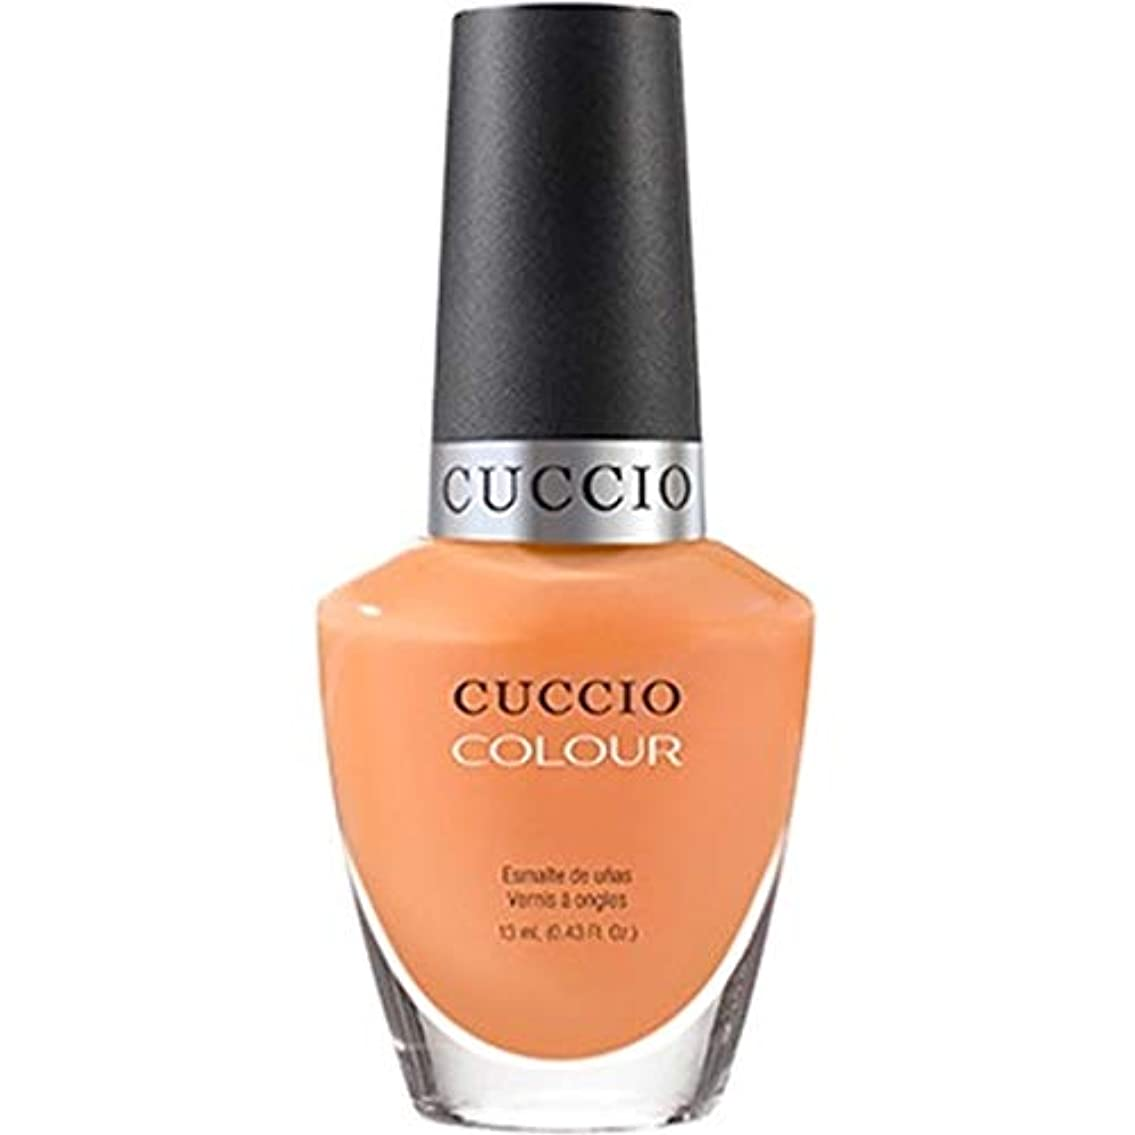 Cuccio Colour Gloss Lacquer - Very Sherbert - 0.43oz / 13ml